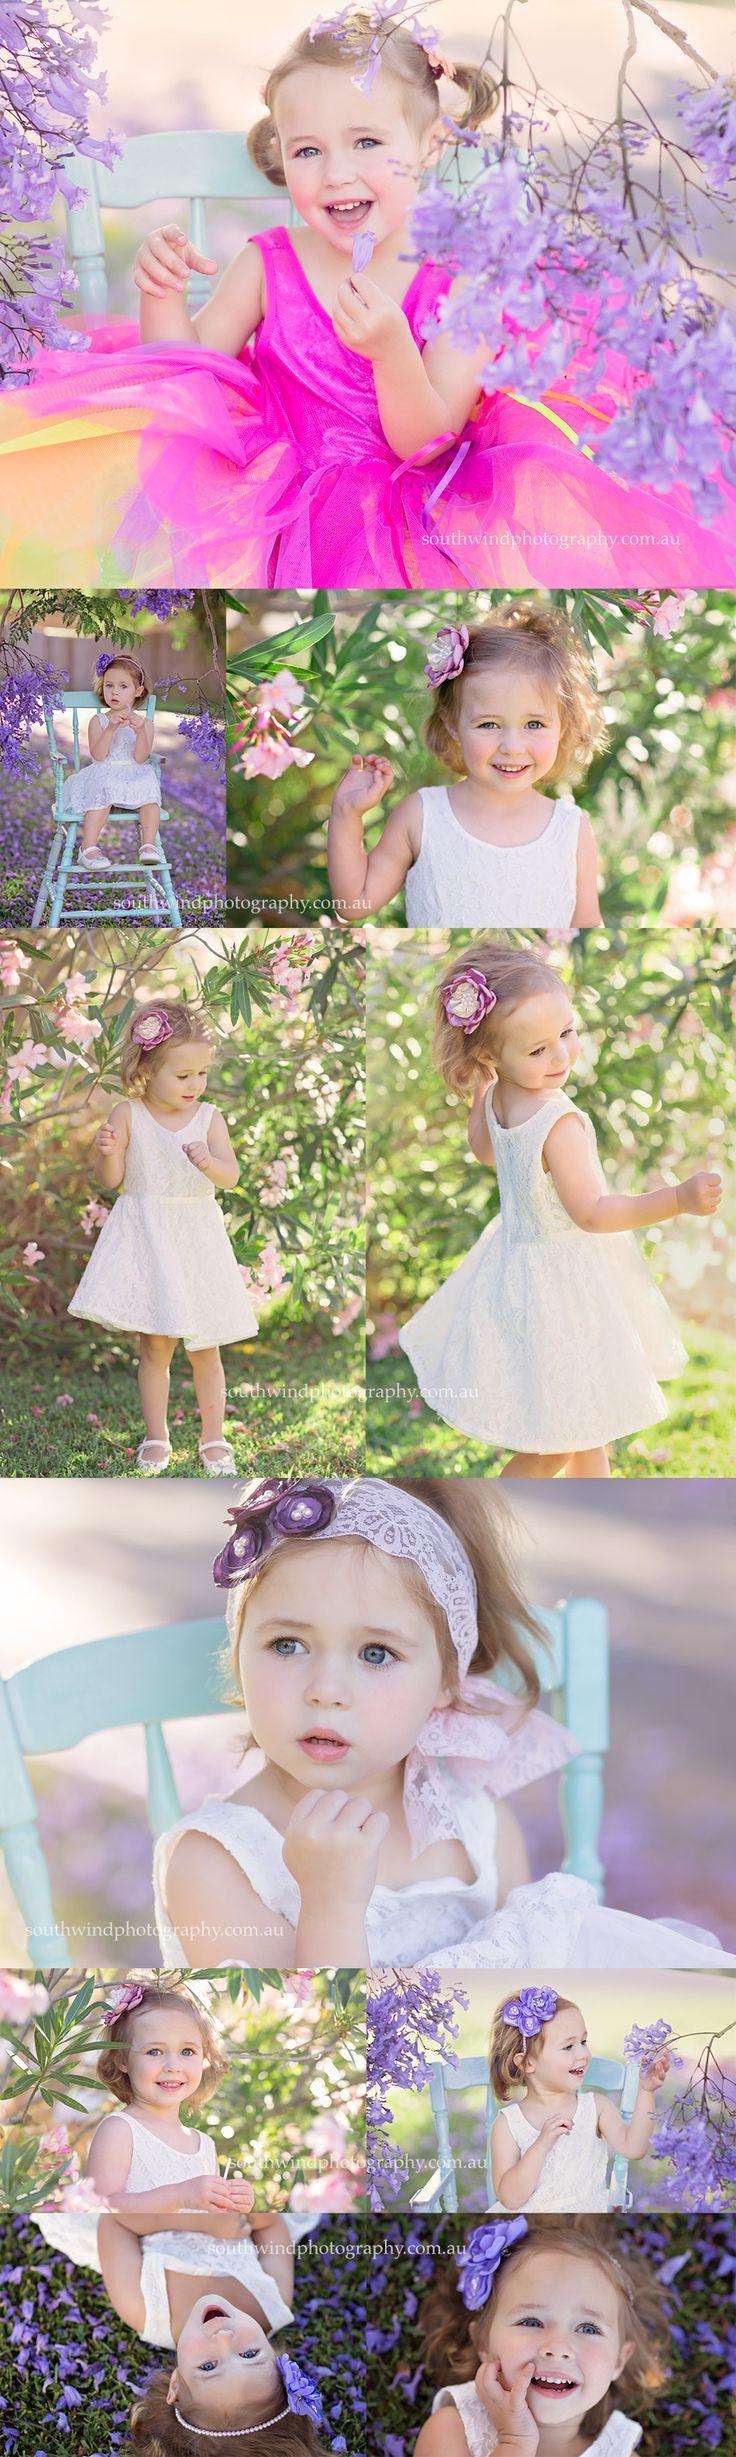 Gorgeous three year old E and Jacaranda flowers | Sydney Children's Photography #portraitphotographer #jacaranda #girl #centralcoast #sydney #purple #pink